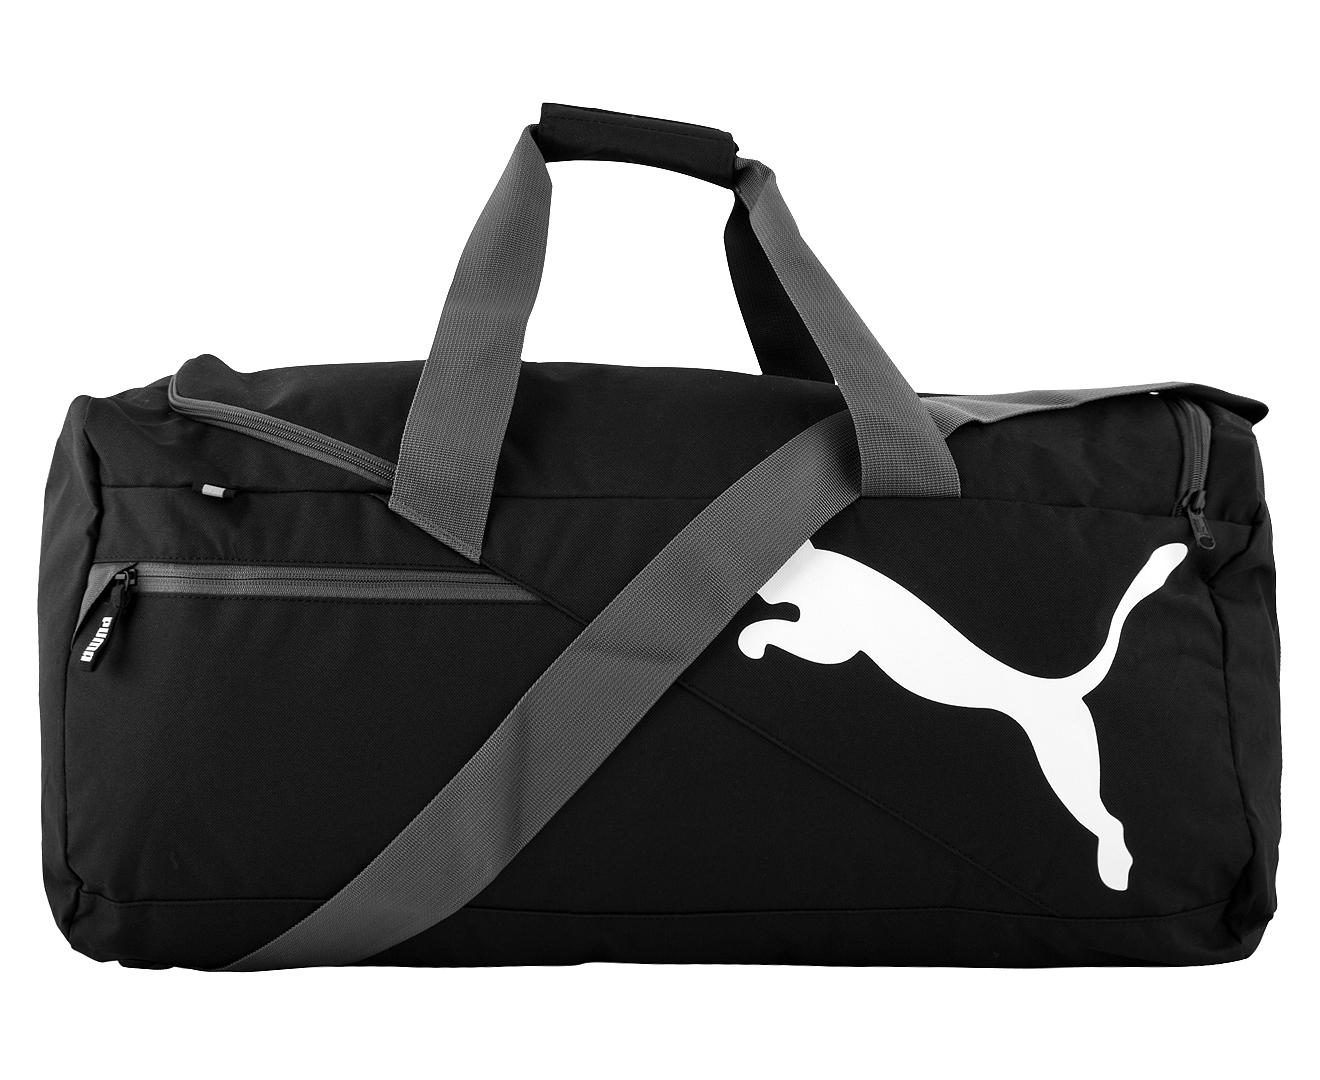 d83801dc0c4a puma gym bag sale cheap   OFF54% Discounted